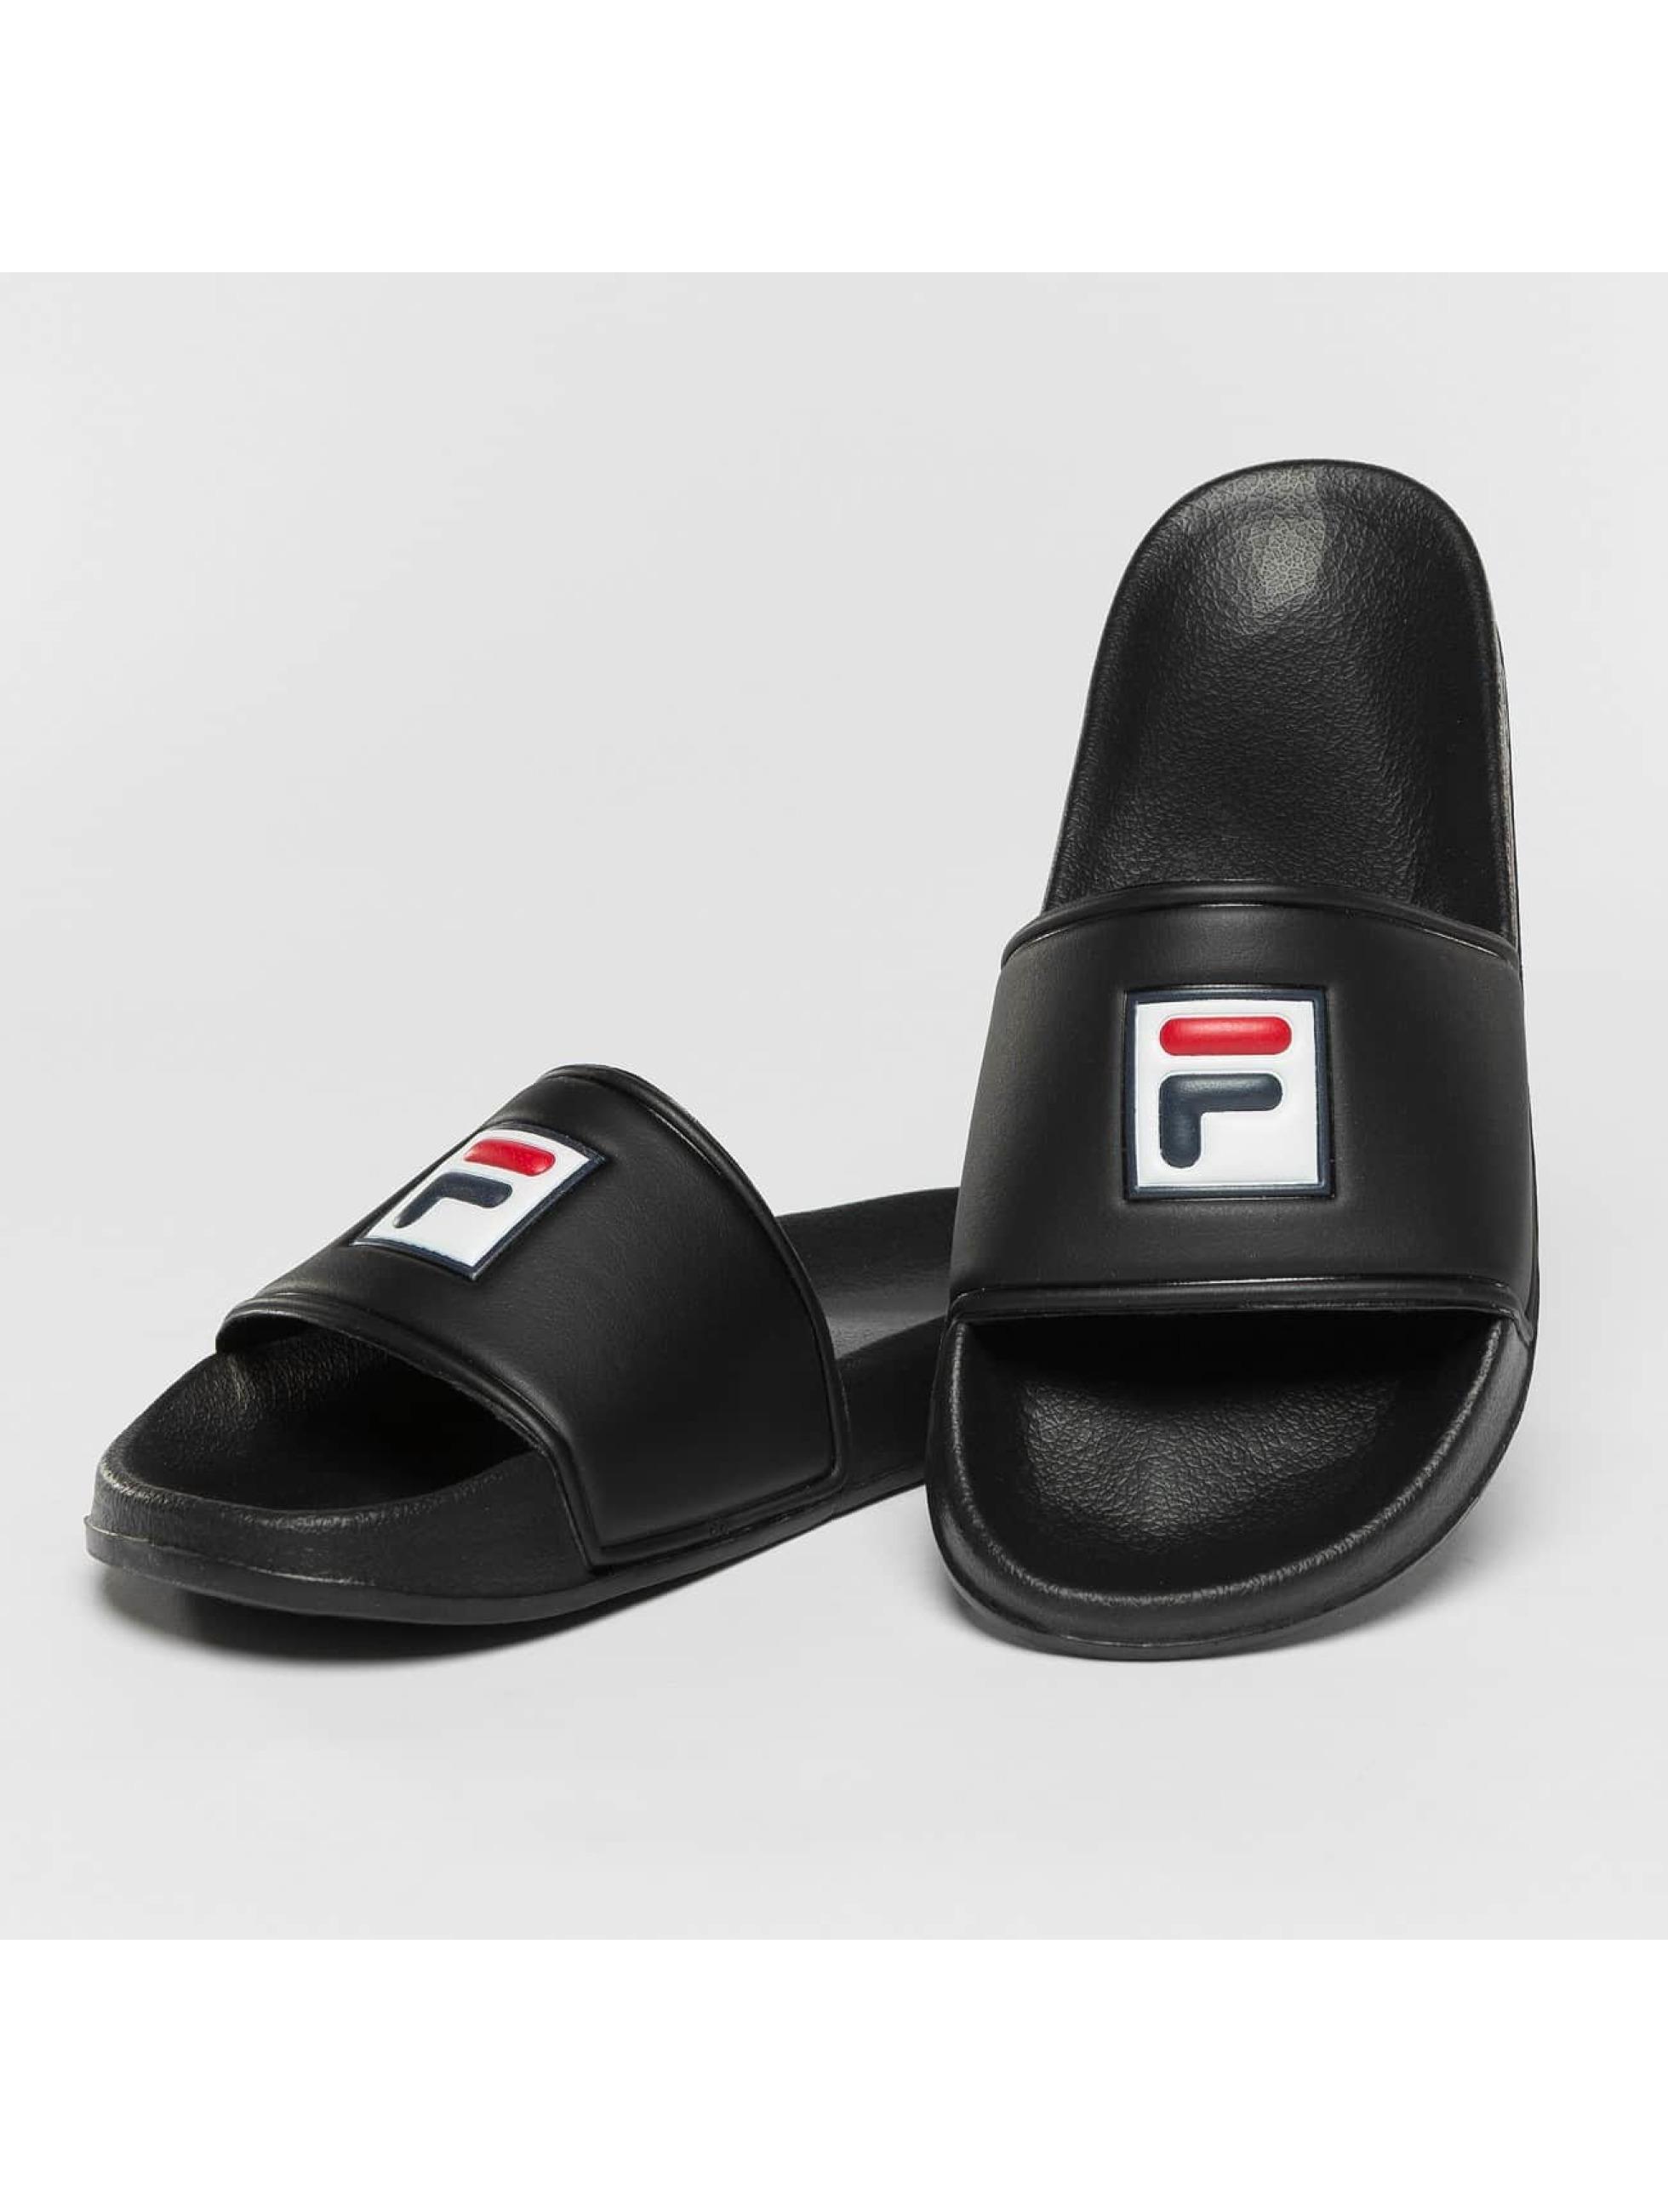 FILA Slipper/Sandaal Base Palm Beach zwart